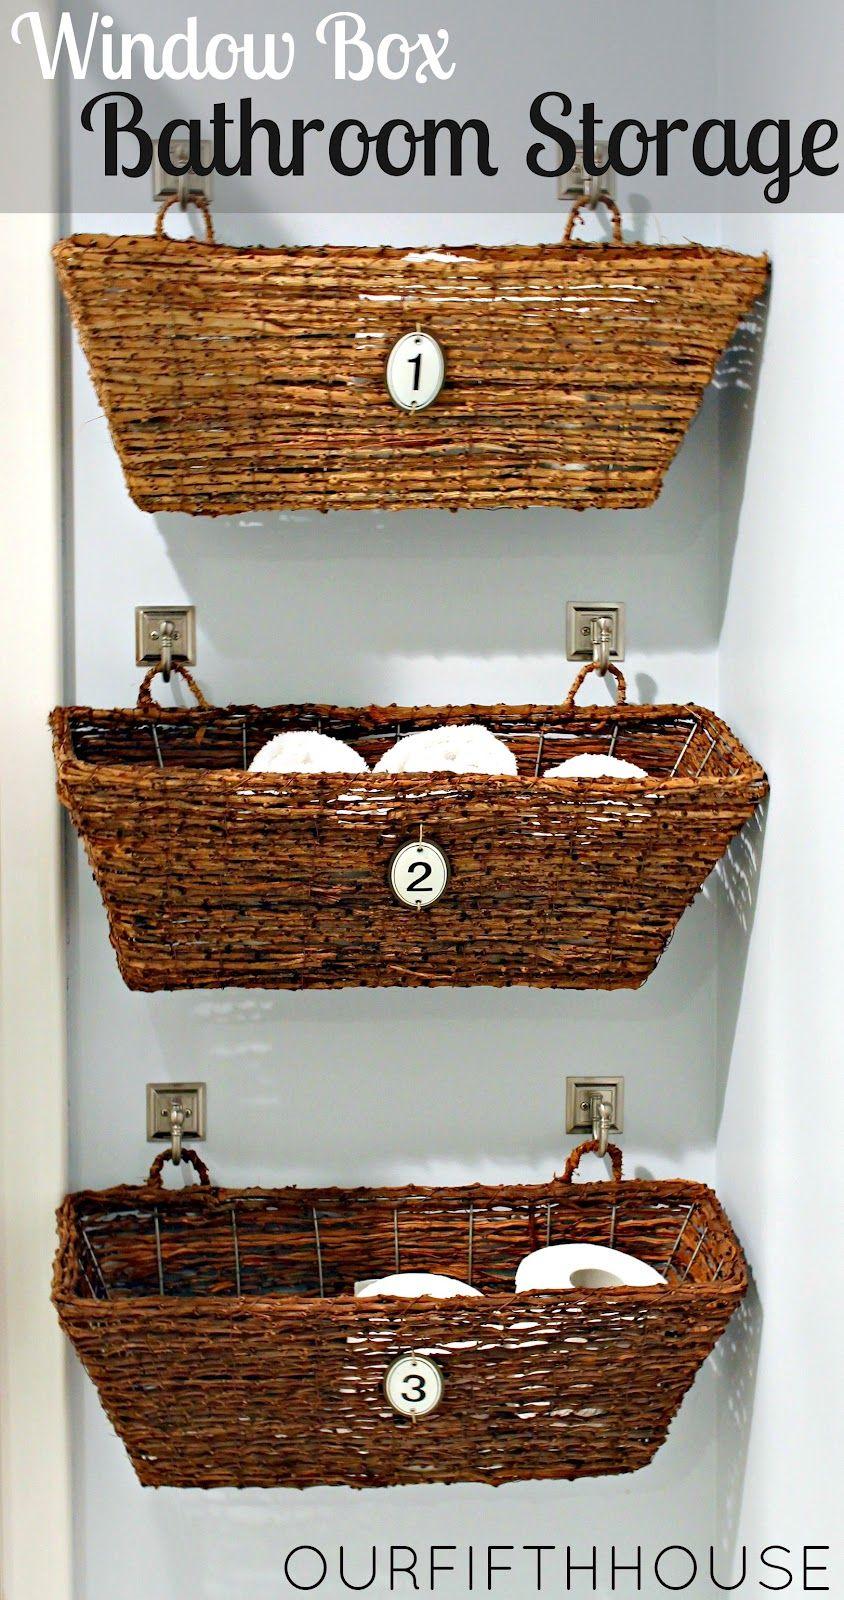 Baskets window box bathroom storage great